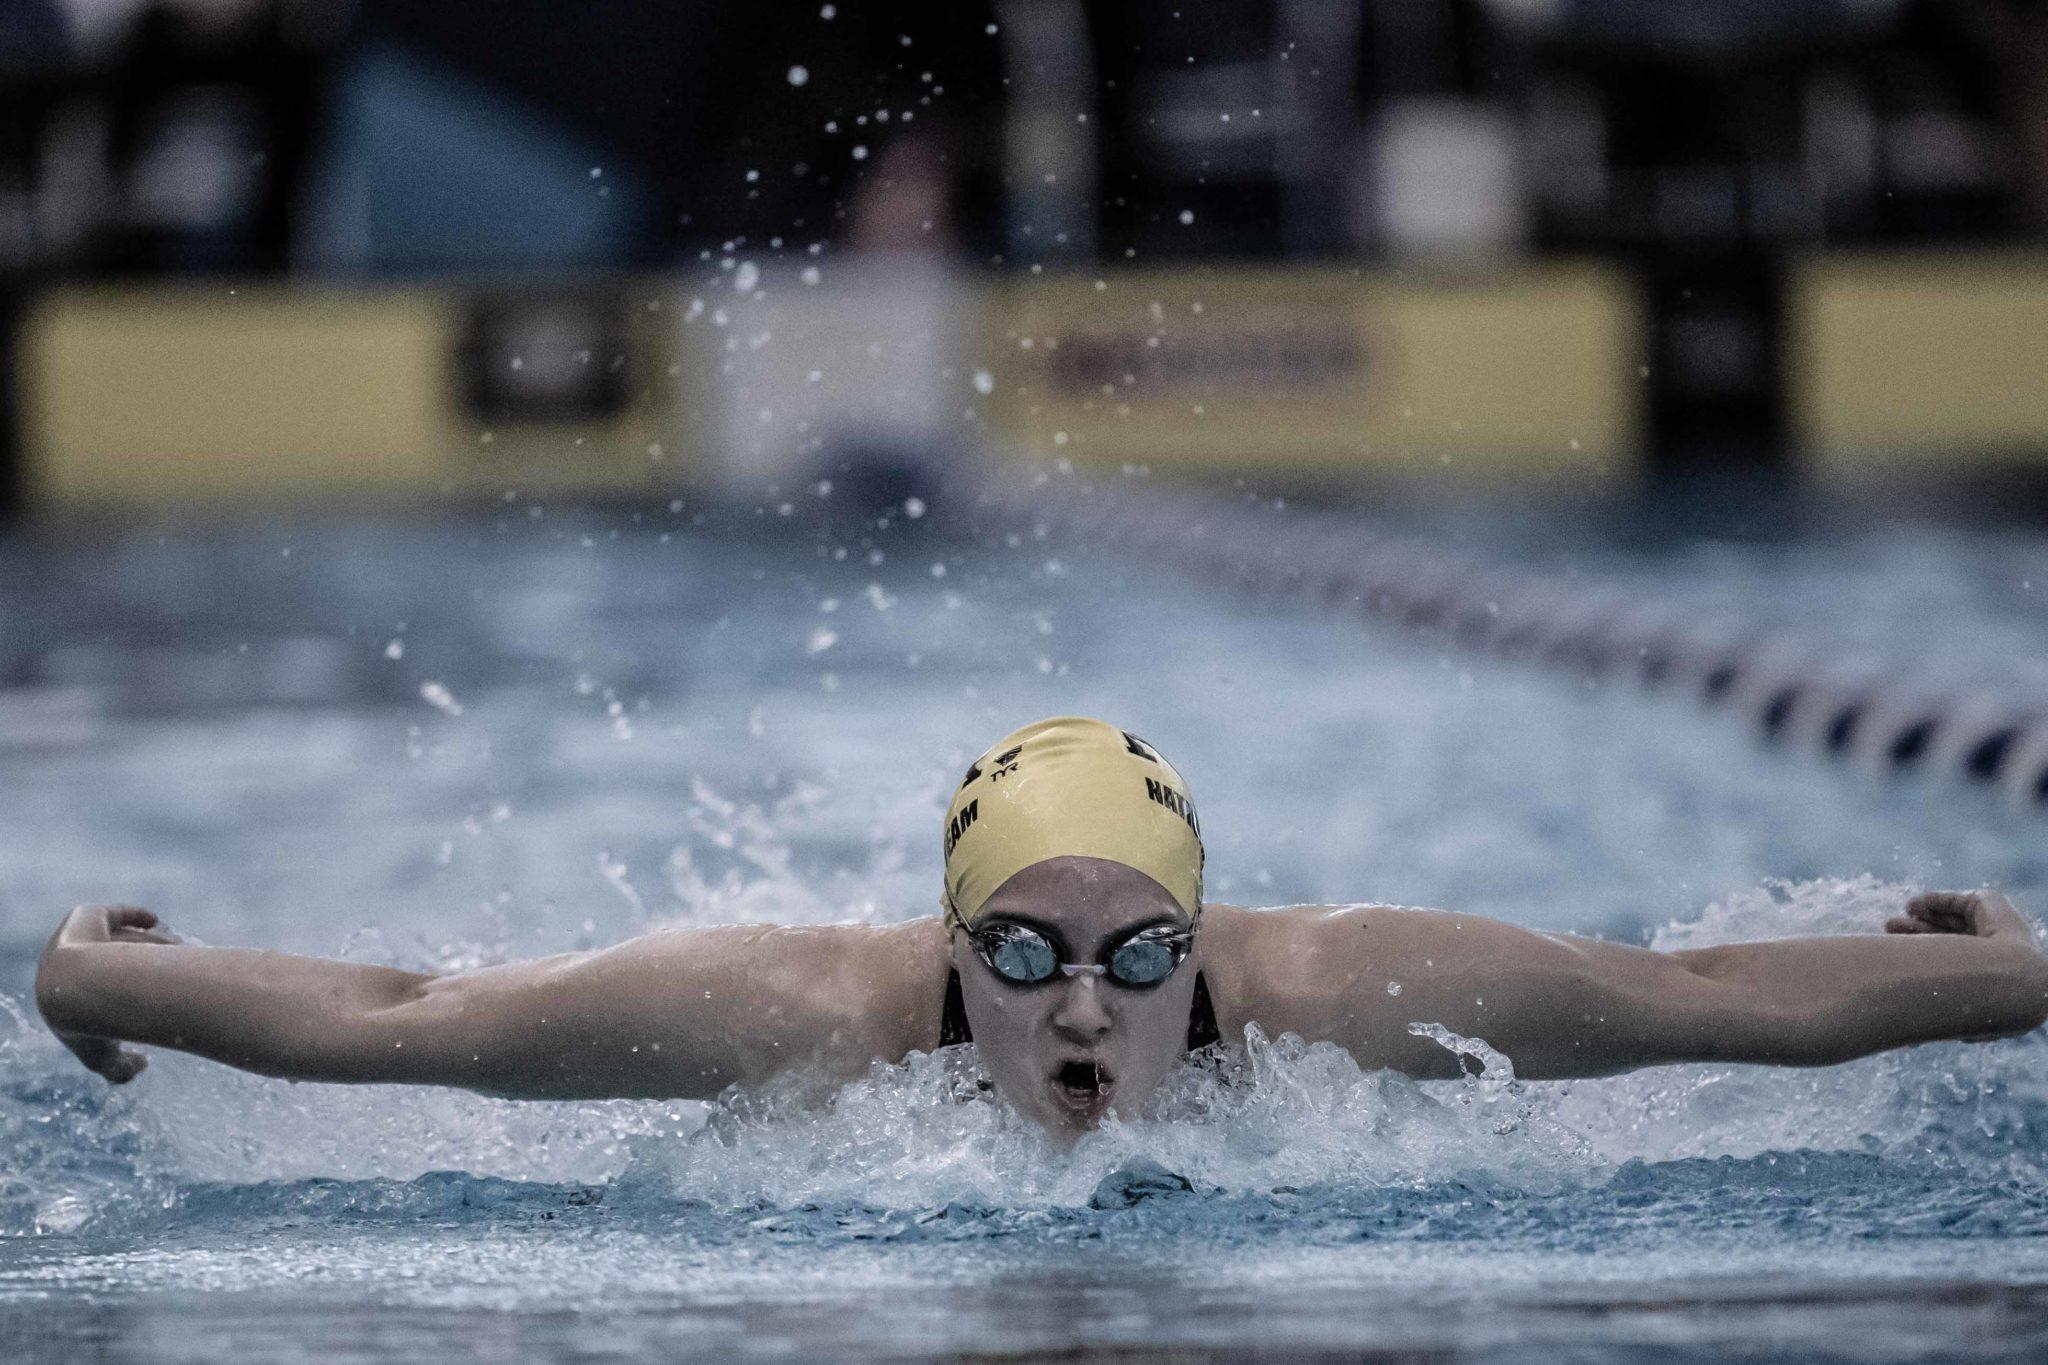 Neuqua Valley High School Girls Swim 3:20 in 400 Yard Free Relay (Race Videos)